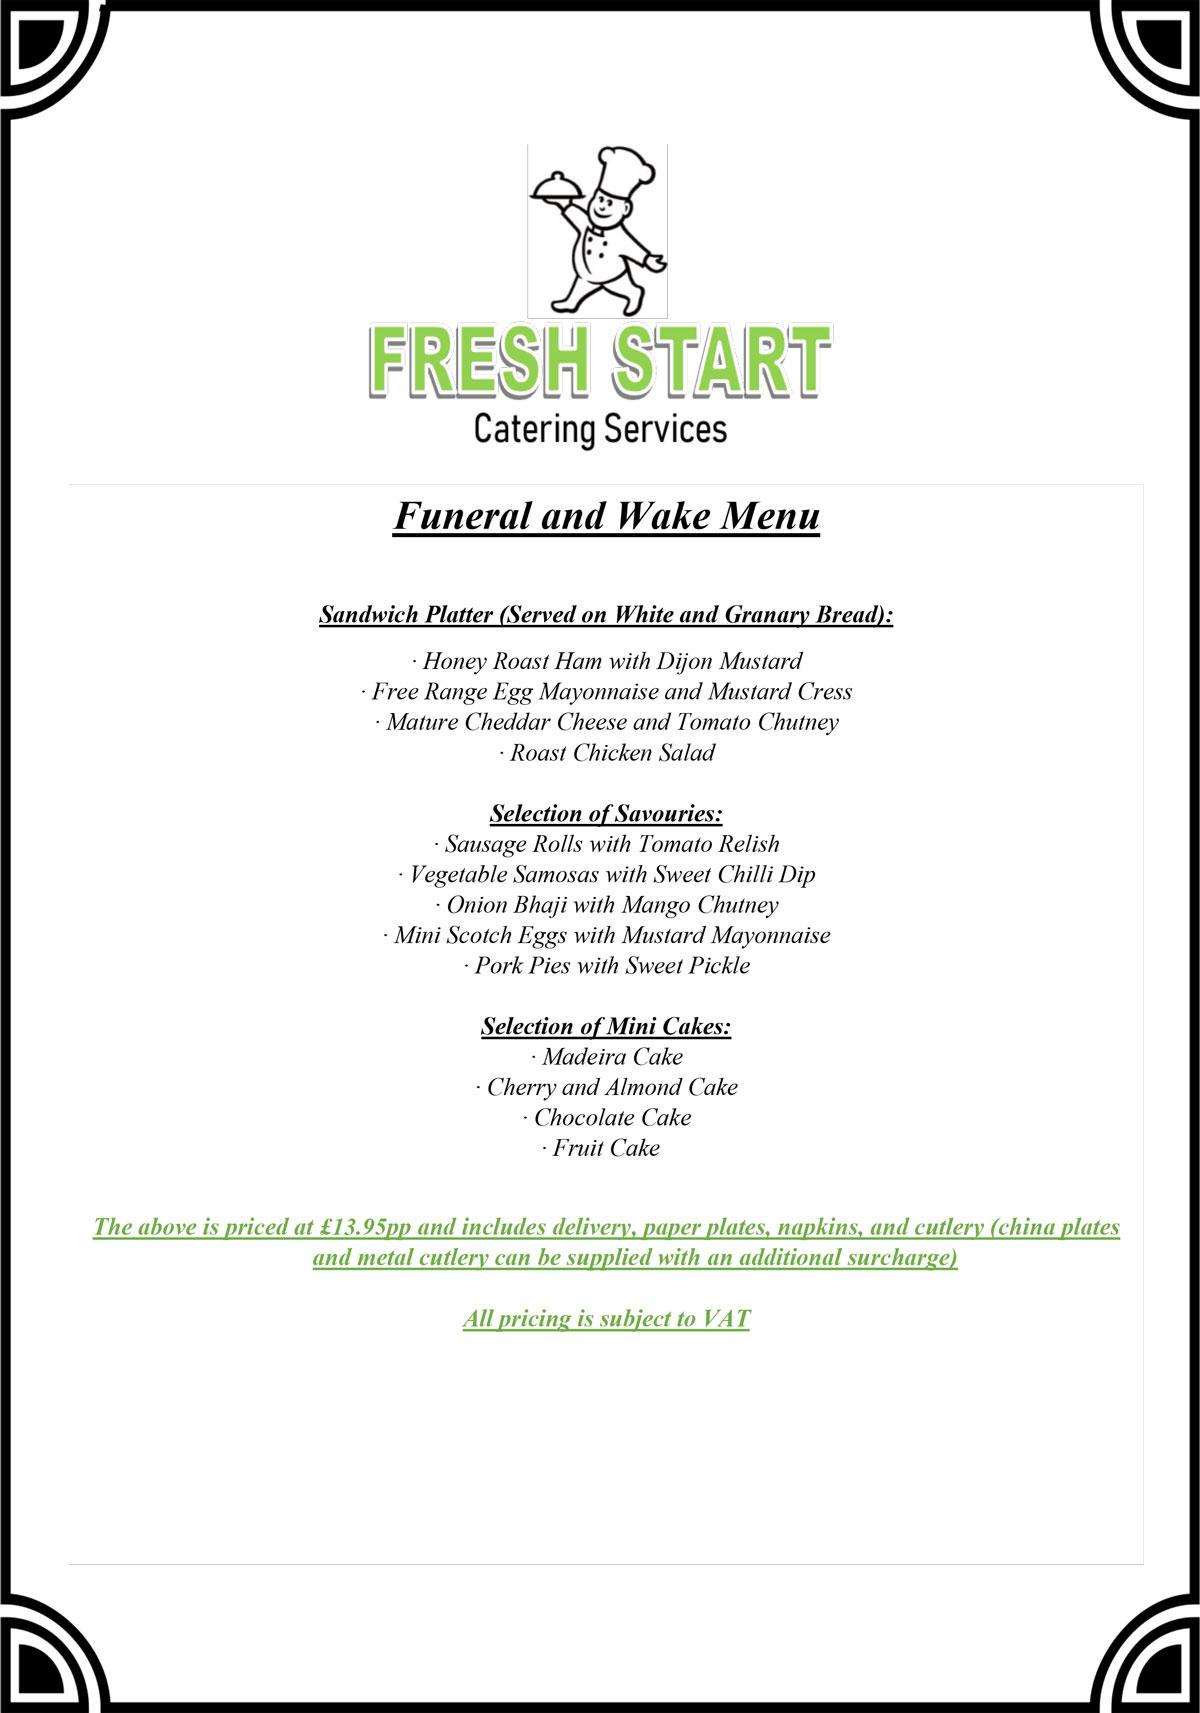 FSCS funeral menu